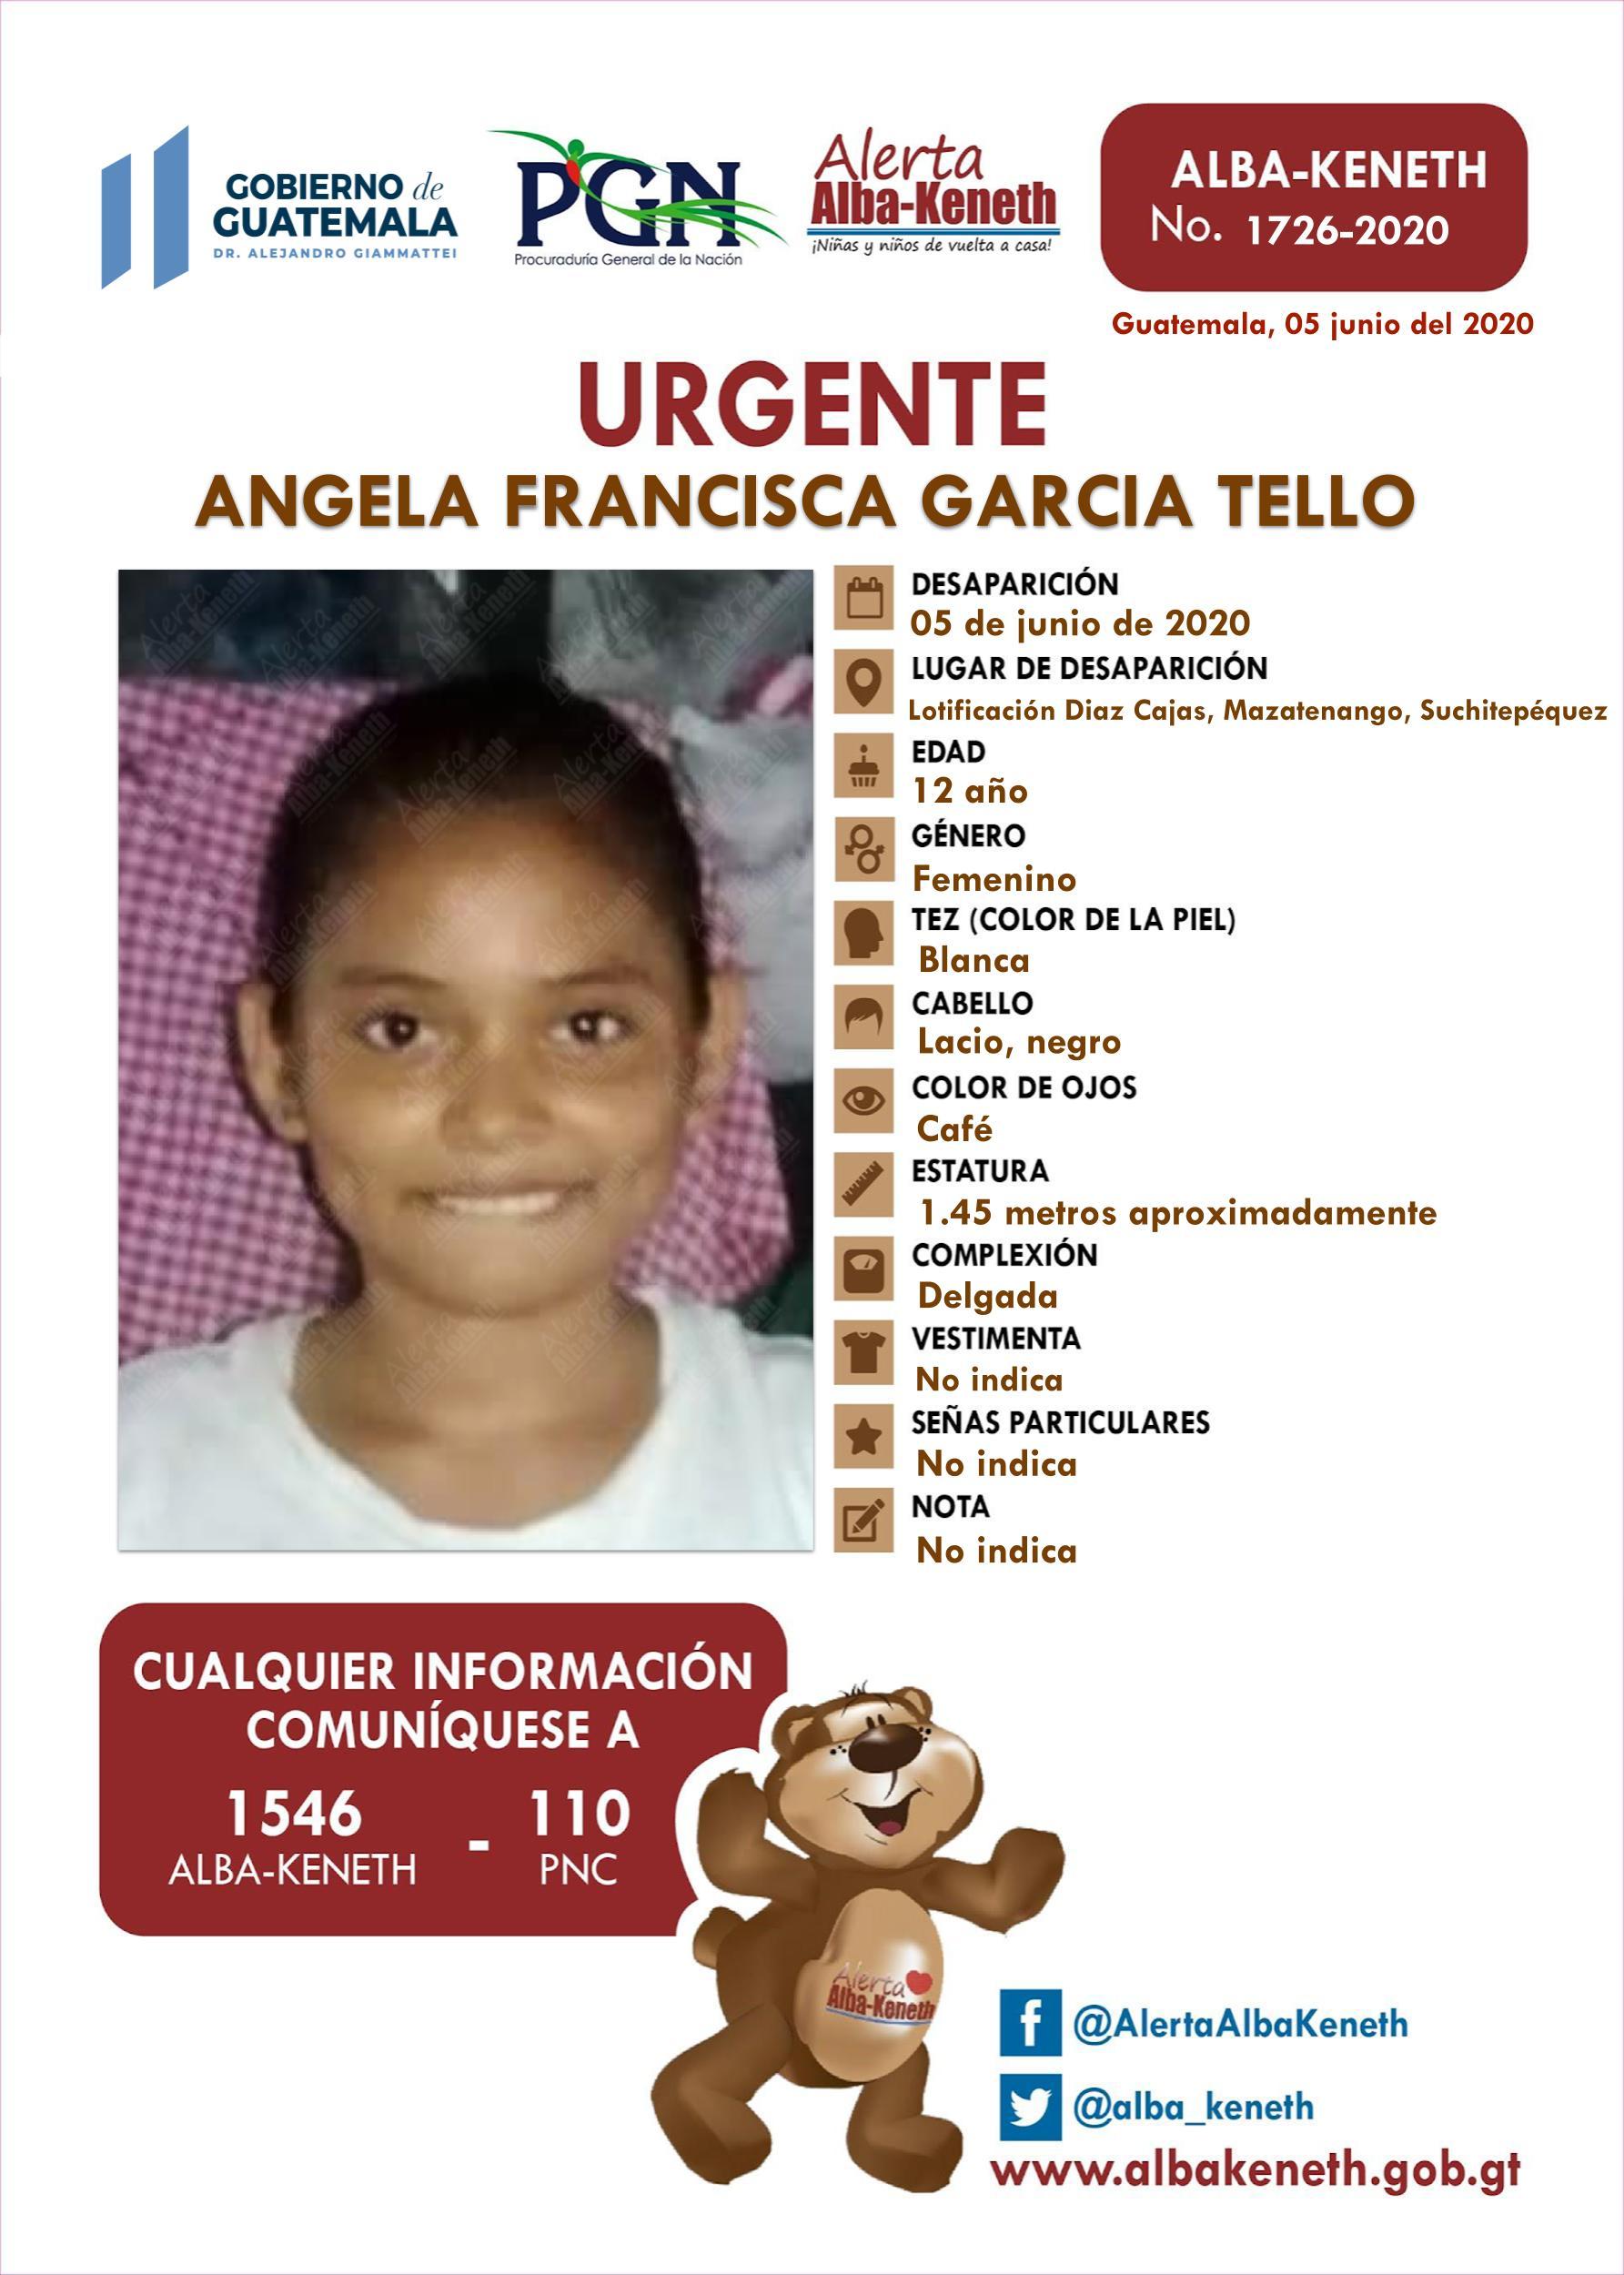 Angela Francisca Garcia Tello